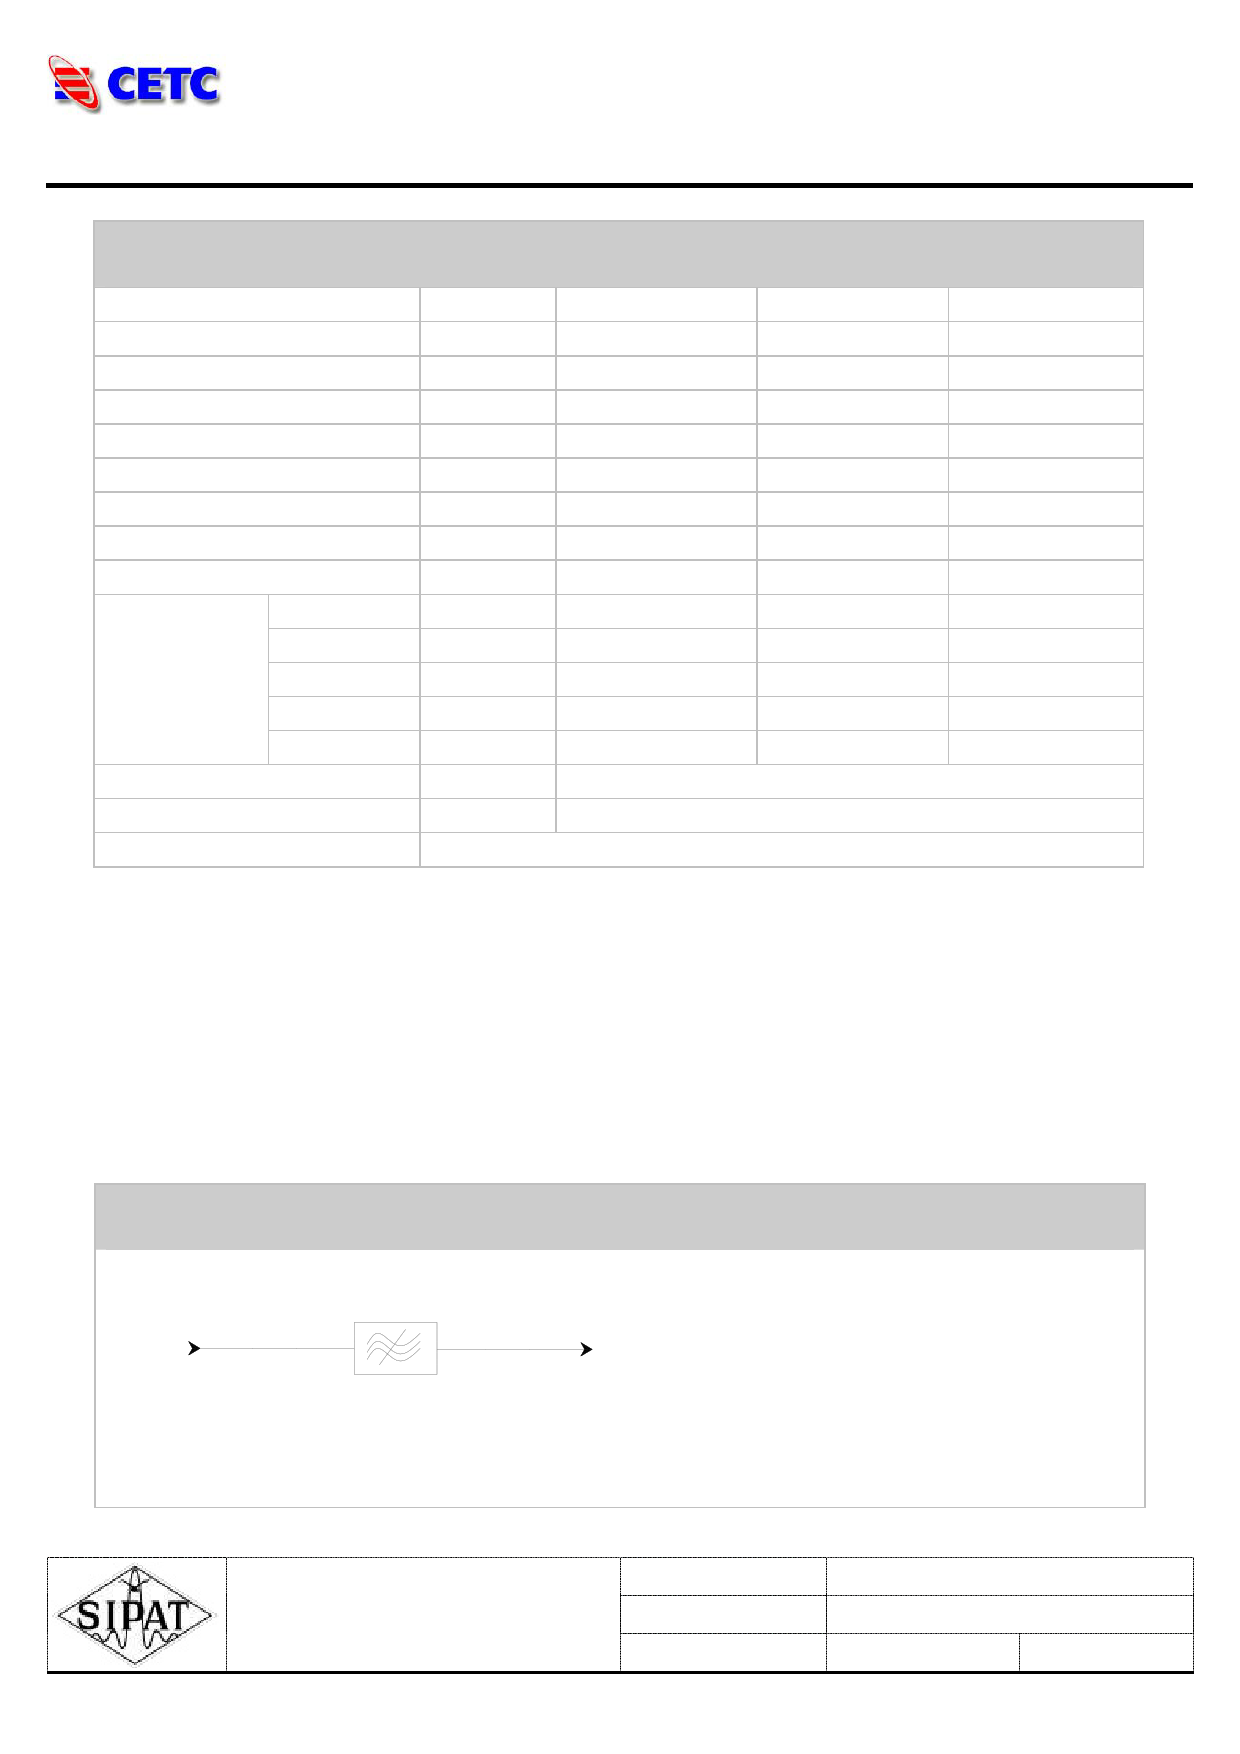 LBN70A29 datasheet